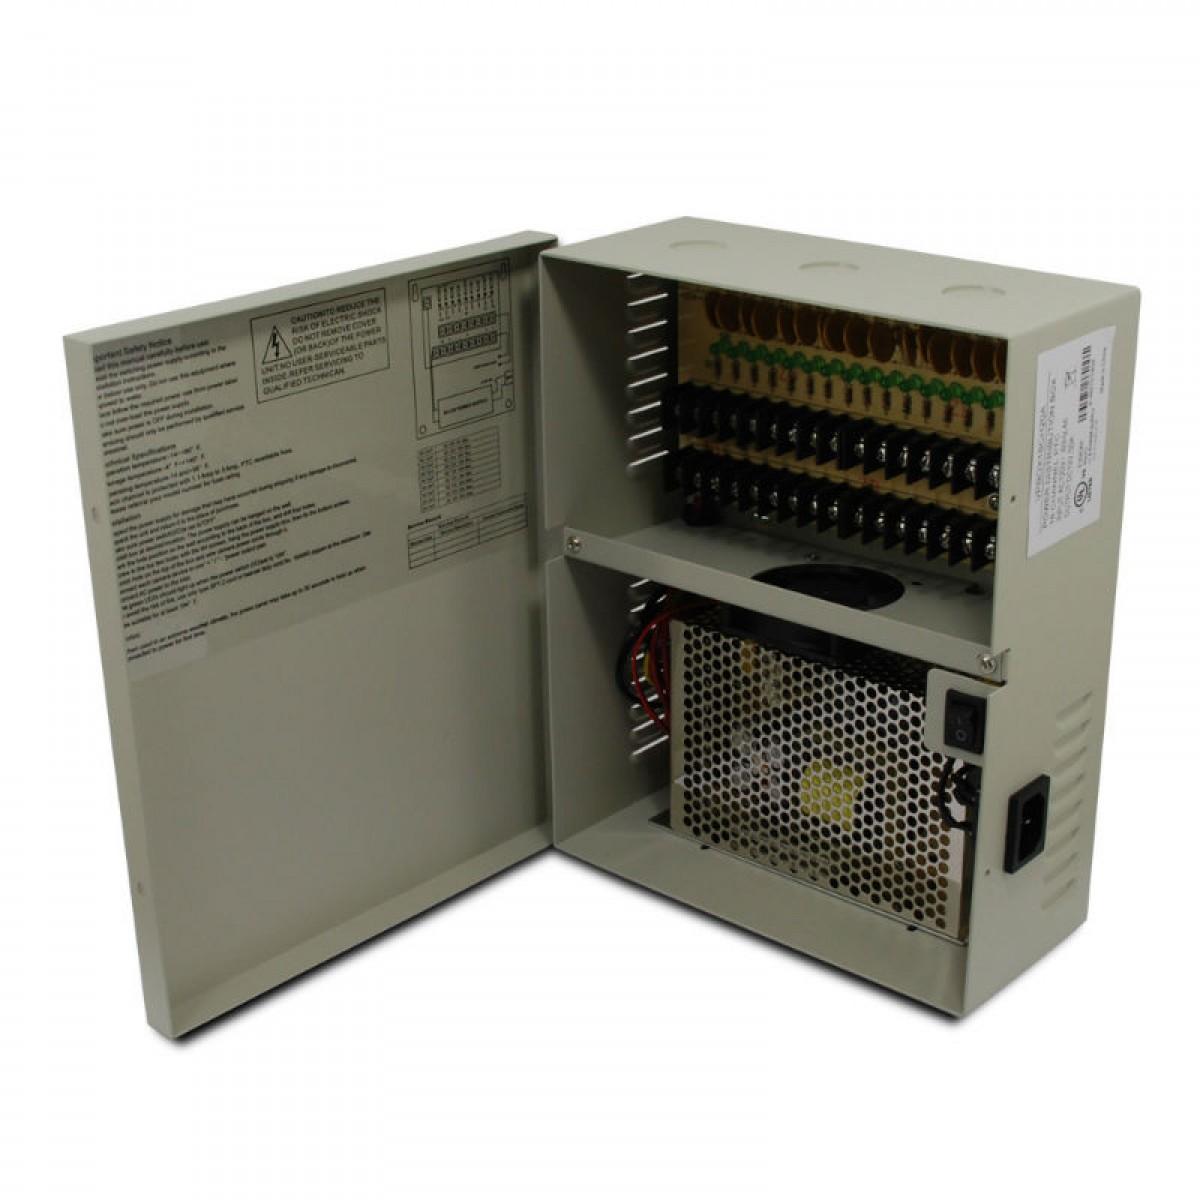 18 CH 20Amp DC12V Power Supply Box  PTC UL Listed